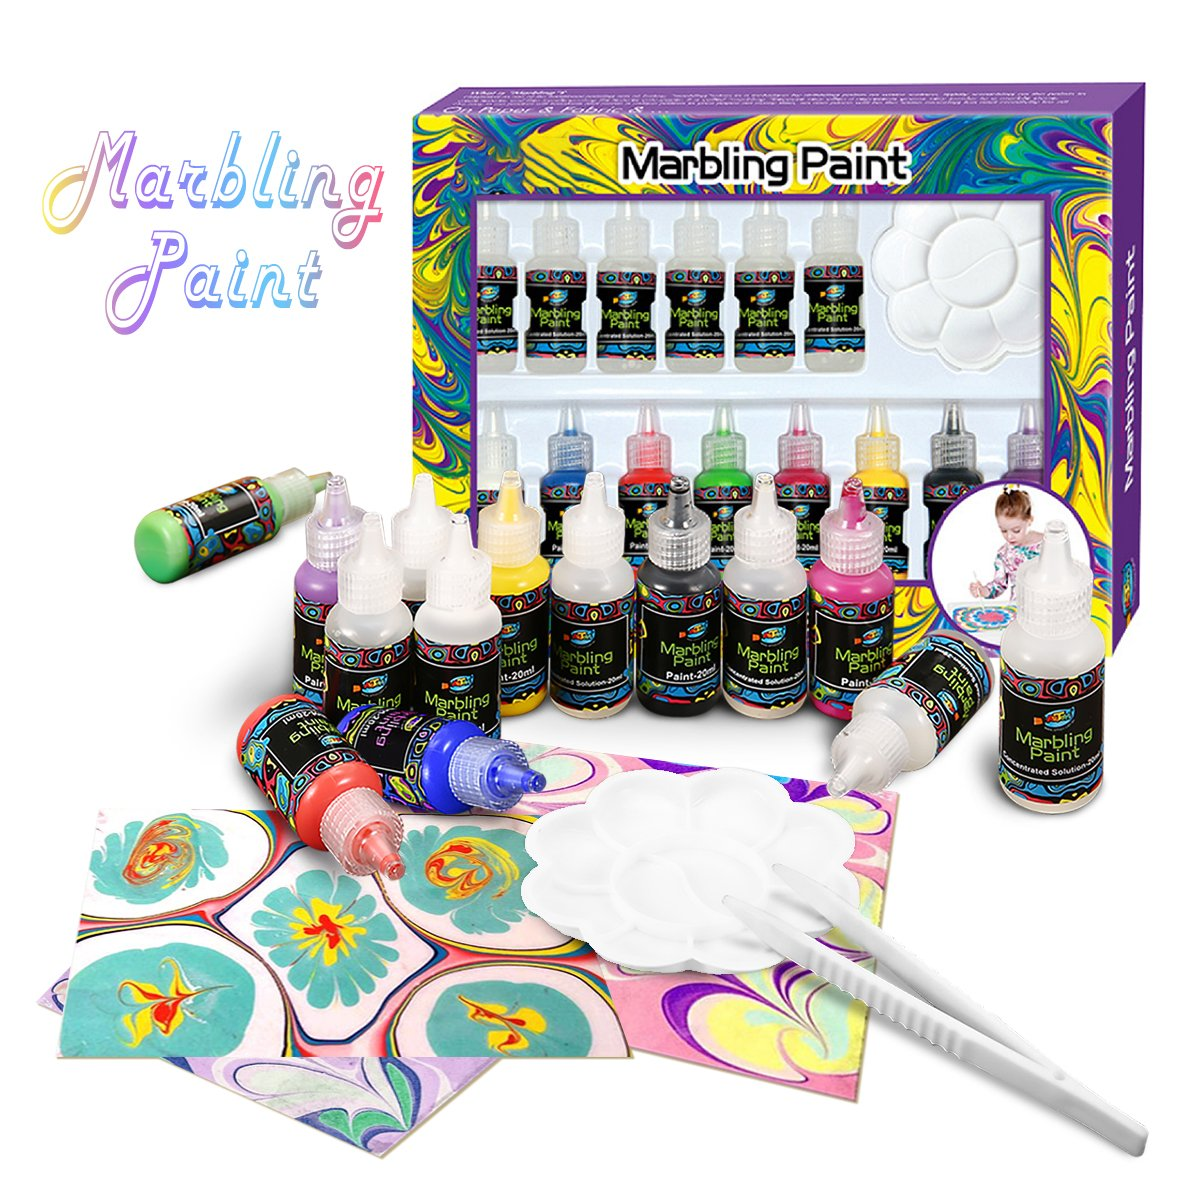 FUNTOK Kids Paint Kit, Arts and Crafts Painting Set Marbling Ink Paint Set Marbling Kit Craft Art Paint Set